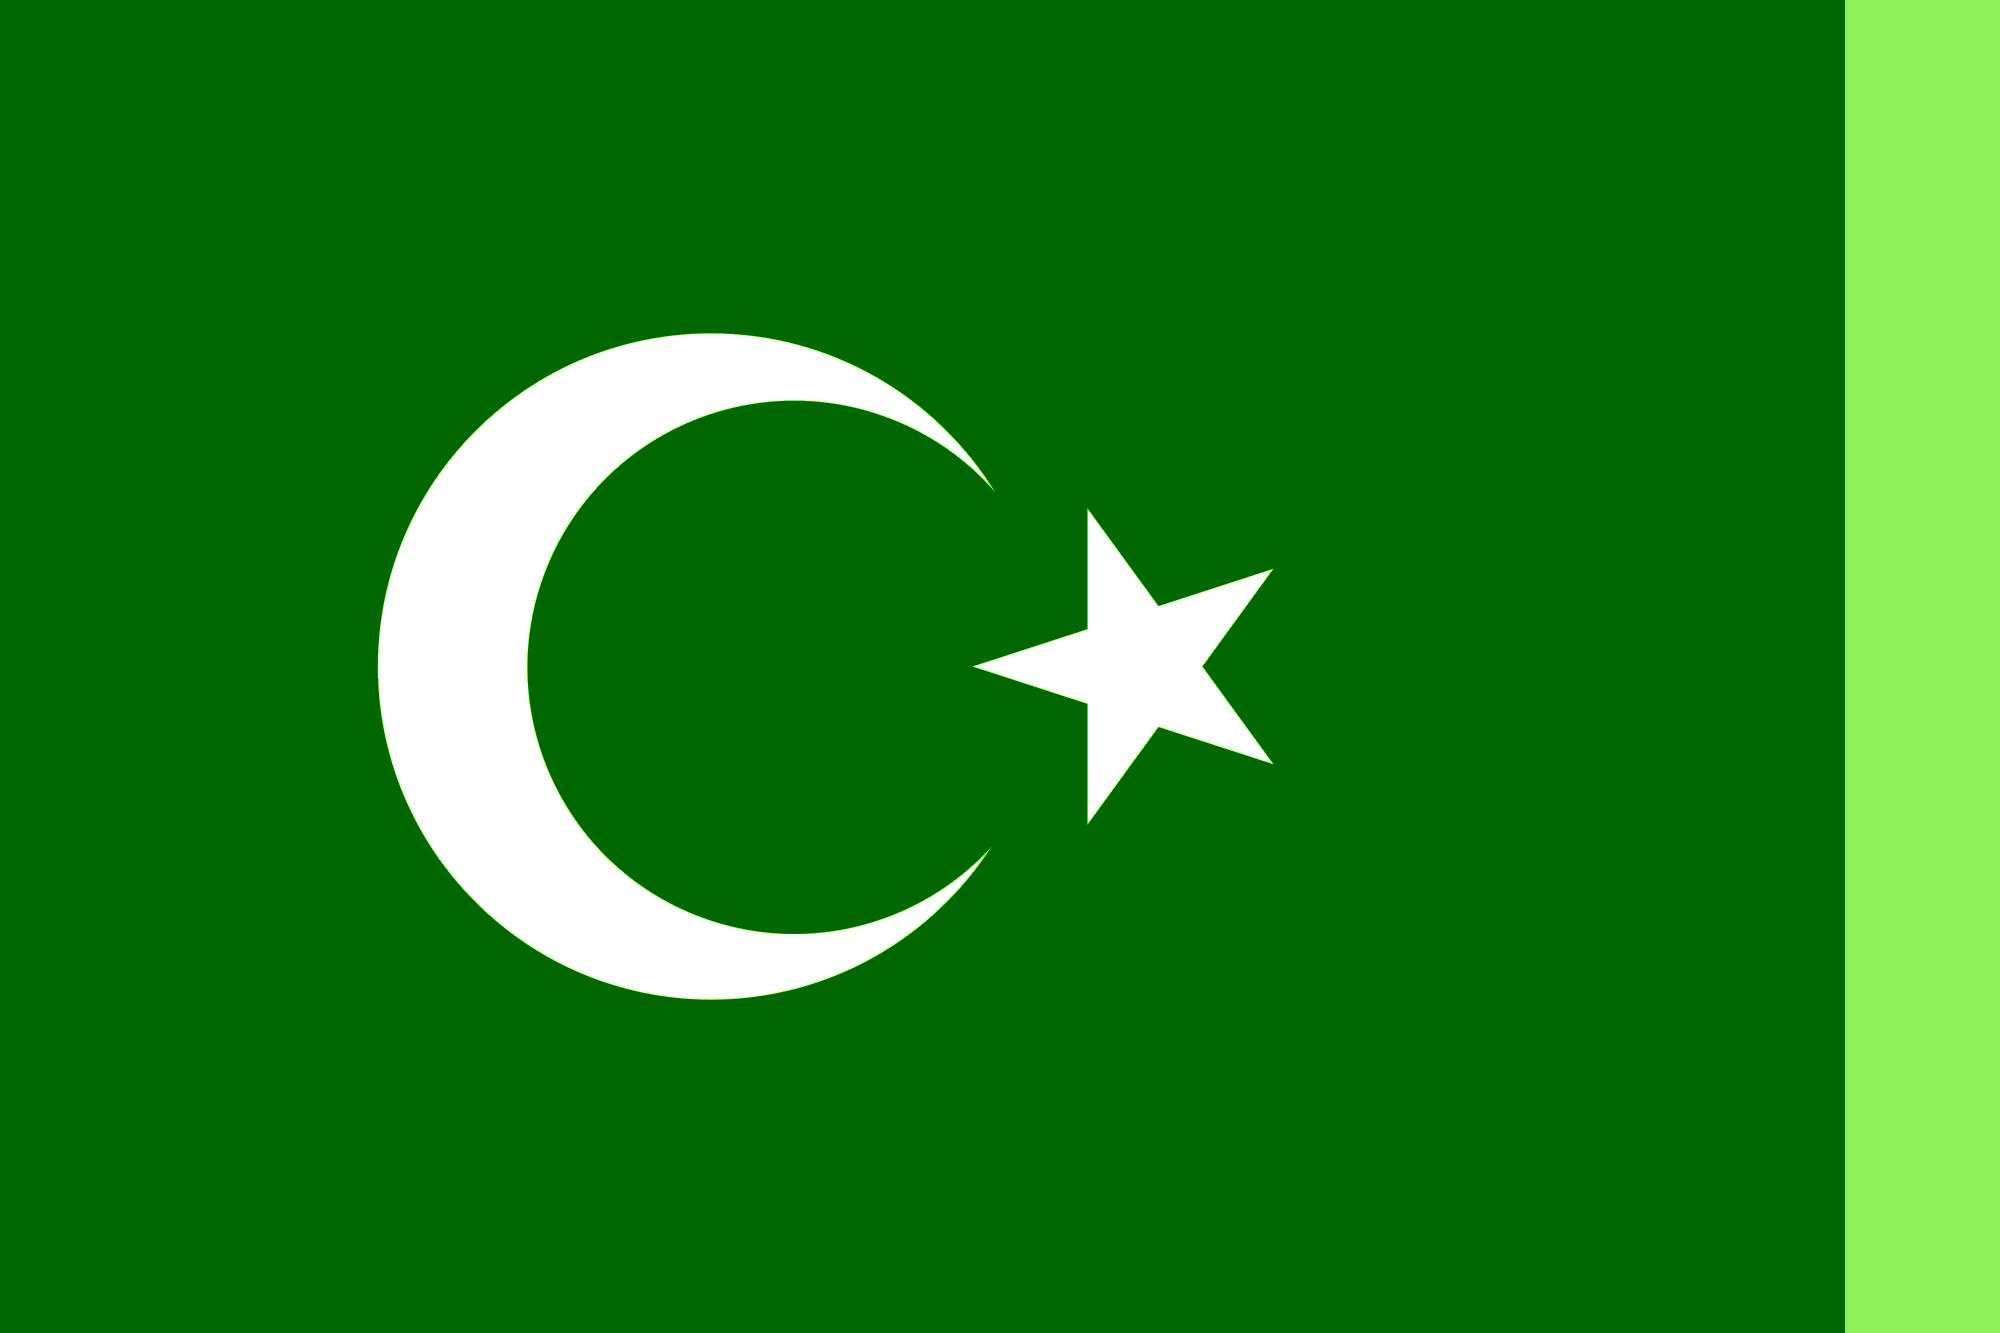 Arab And Middle Eastern Alliance Avaro Alternative History